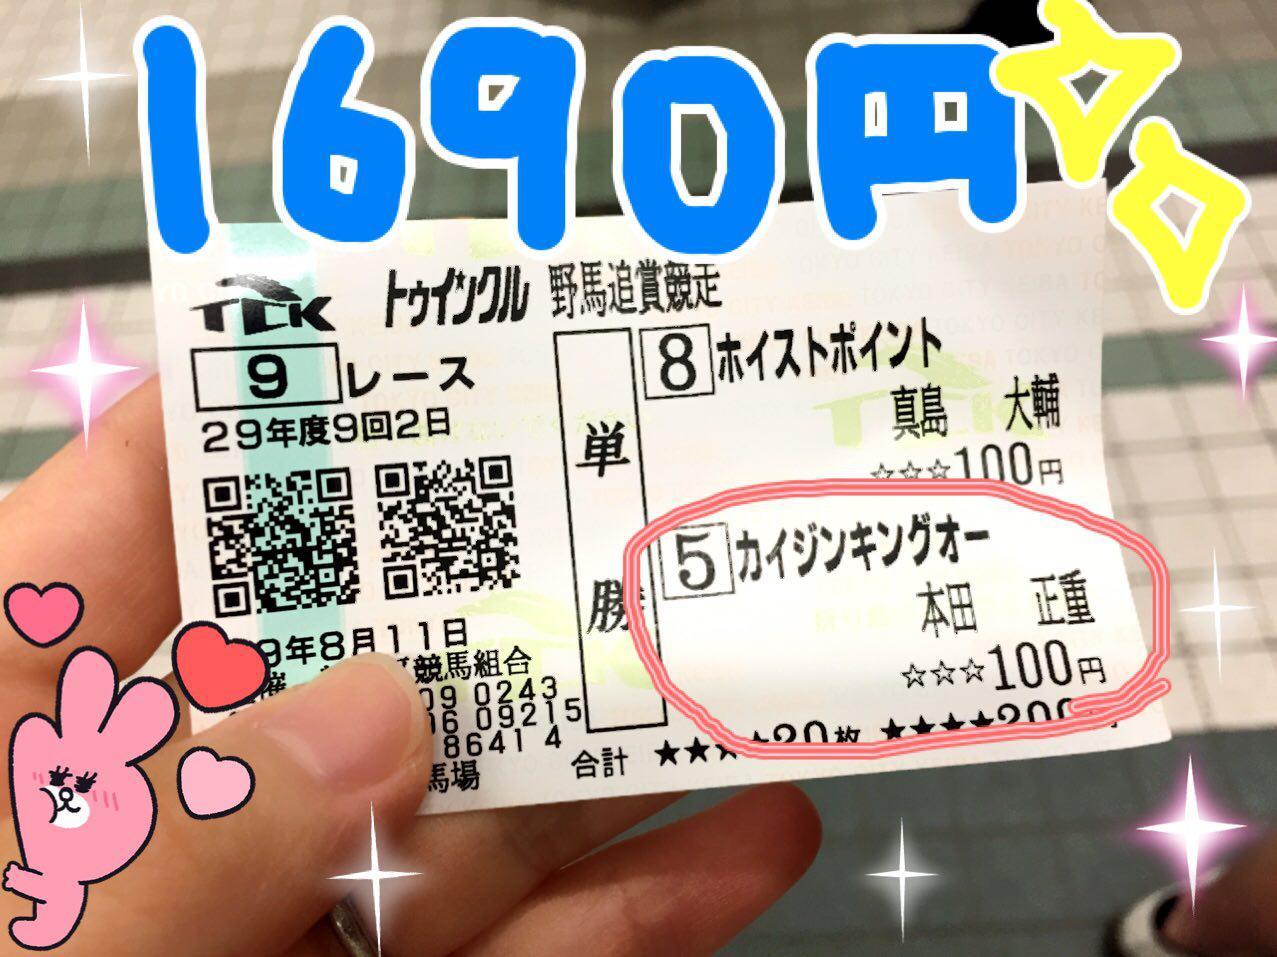 photo_2017-08-12_01-25-33.jpg